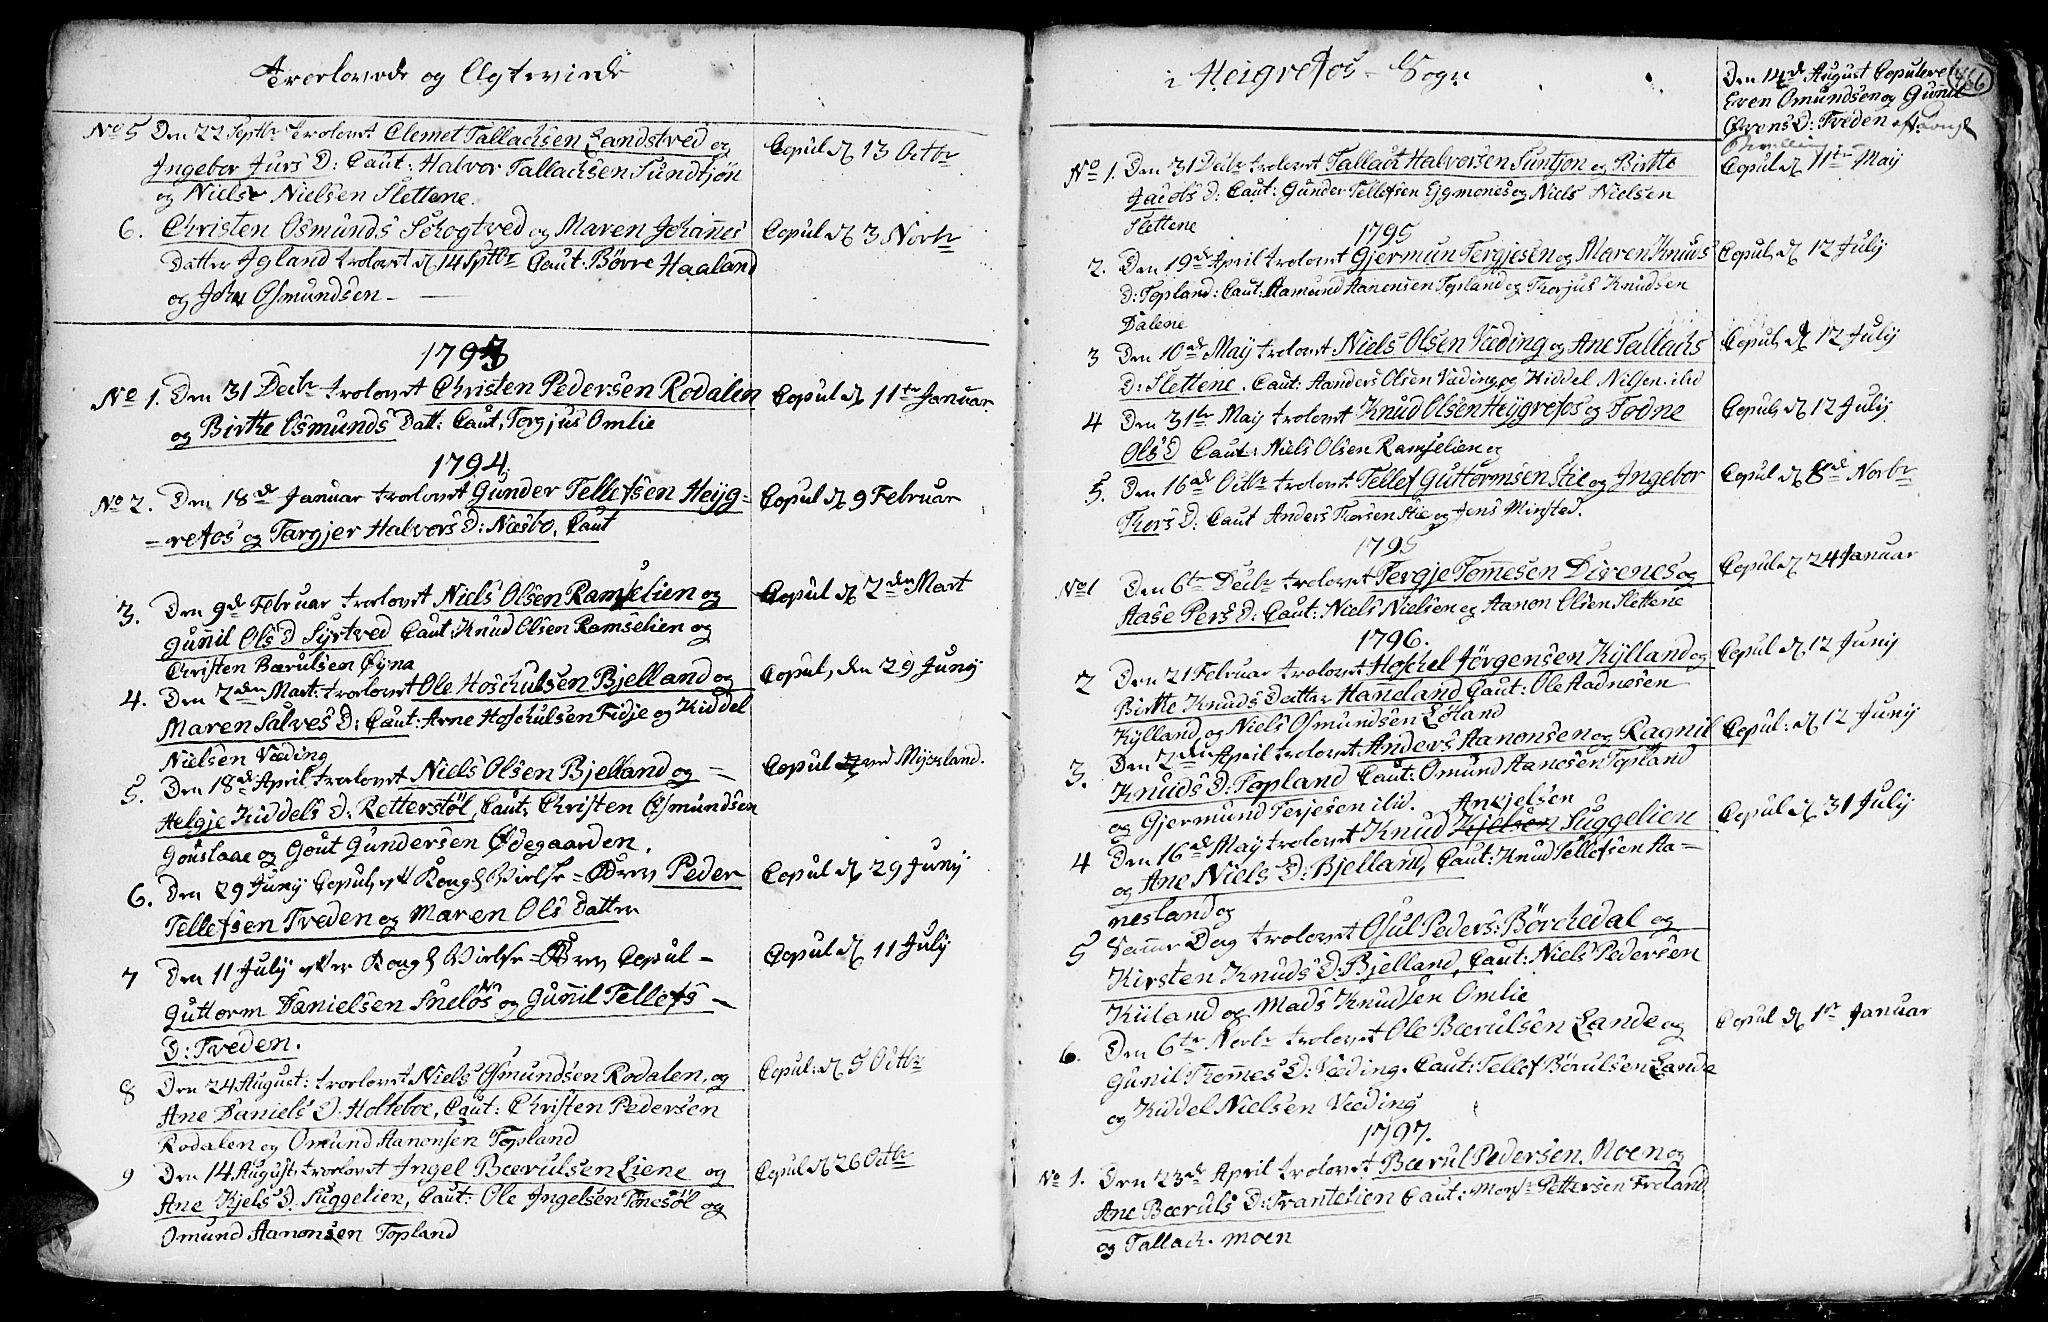 SAK, Hommedal sokneprestkontor, F/Fa/Fab/L0002: Ministerialbok nr. A 2 /3, 1740-1821, s. 466